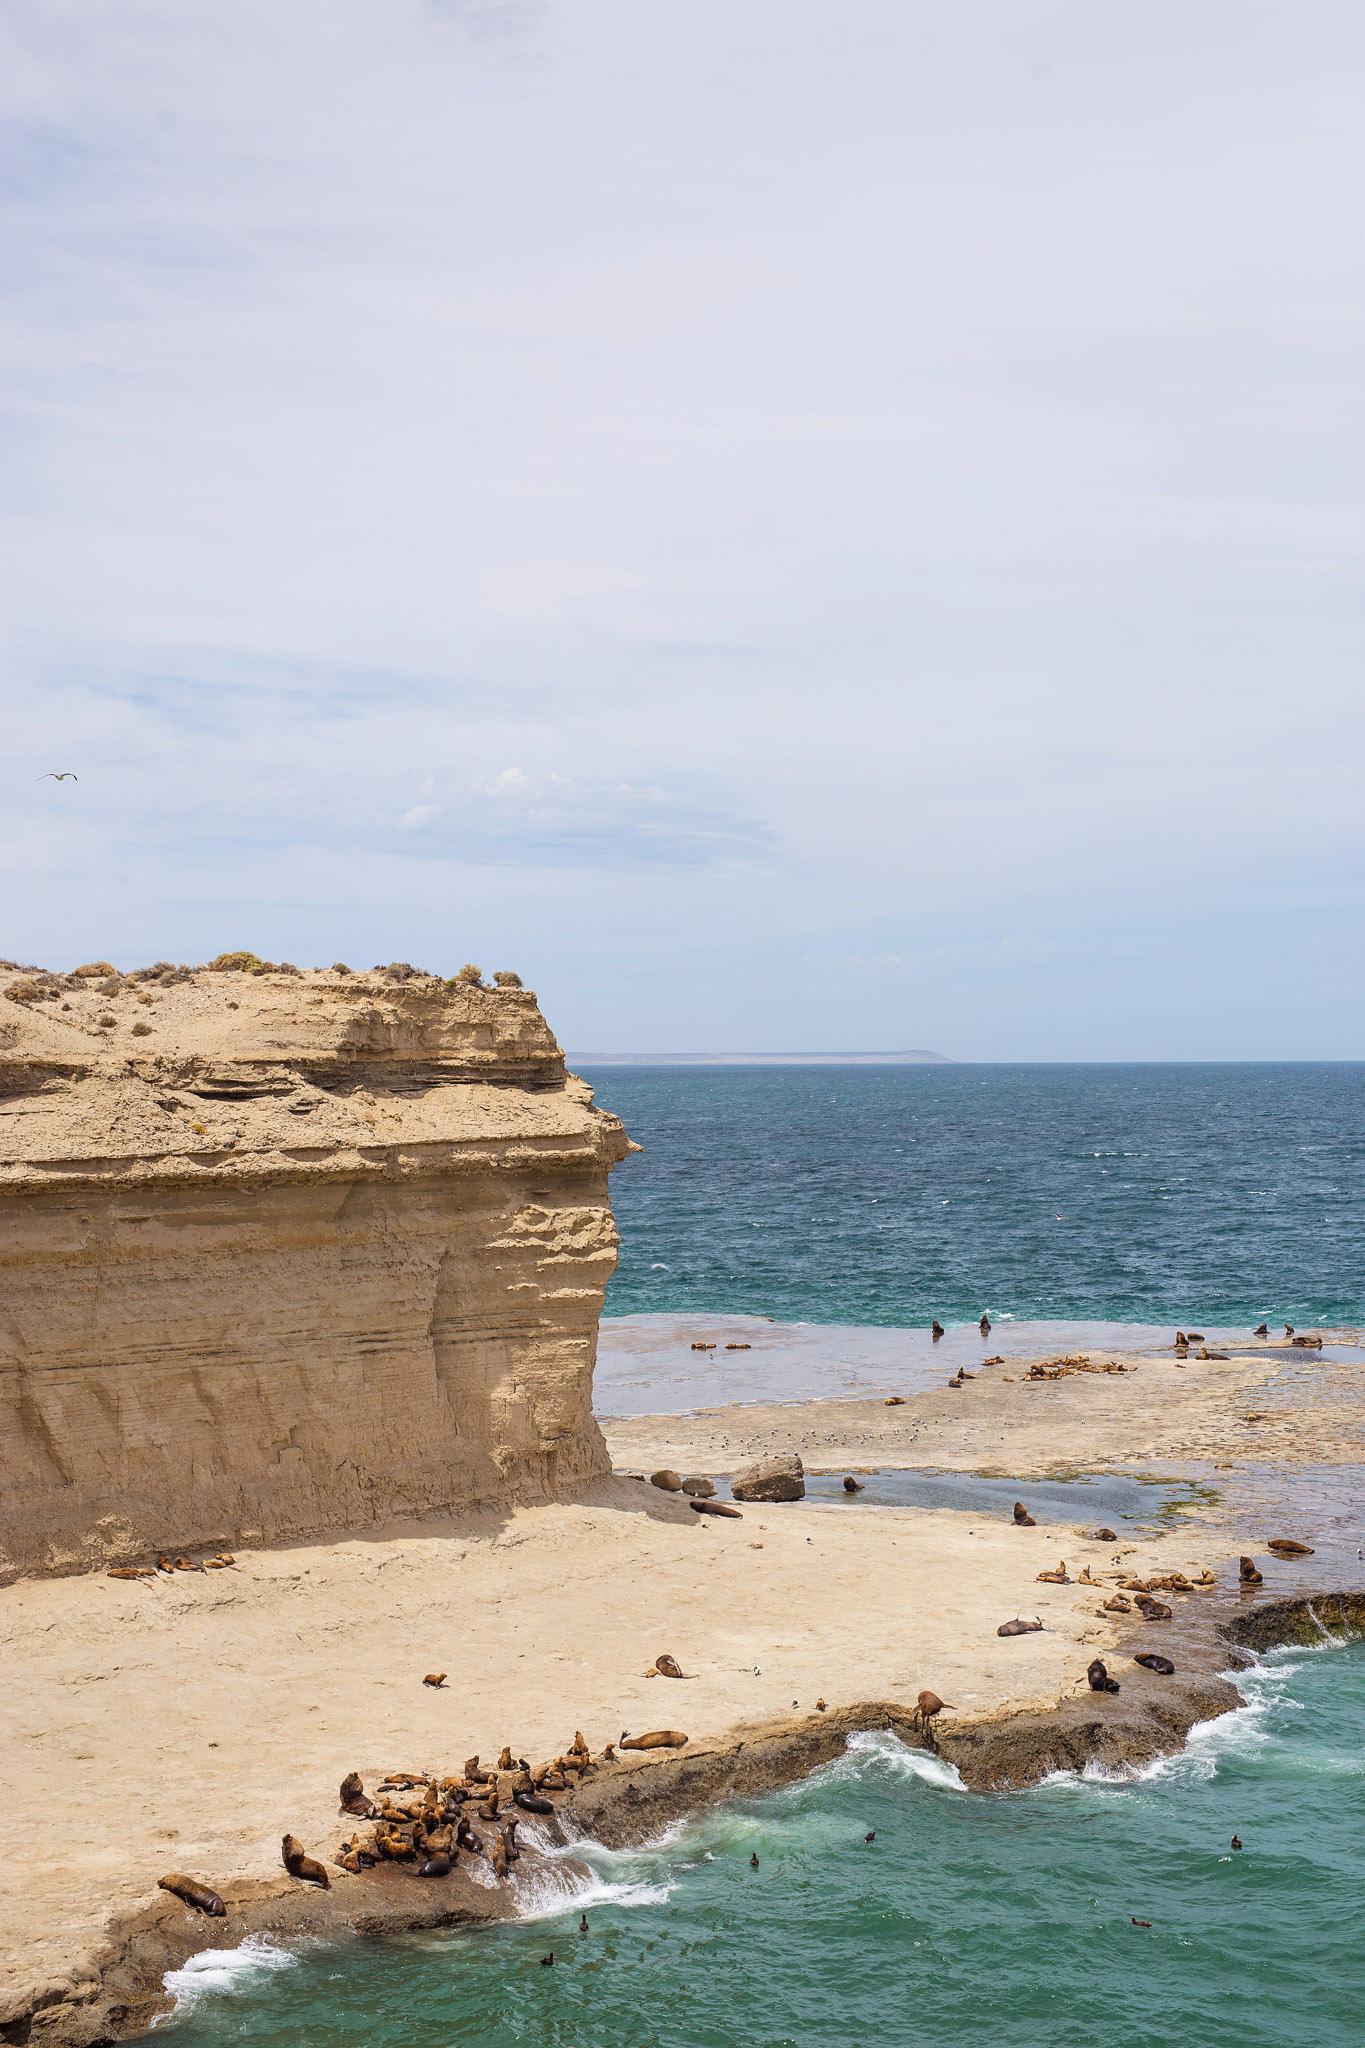 wedding-travellers-argentina-peninsula-valdes-sea-lion-cliff-shore